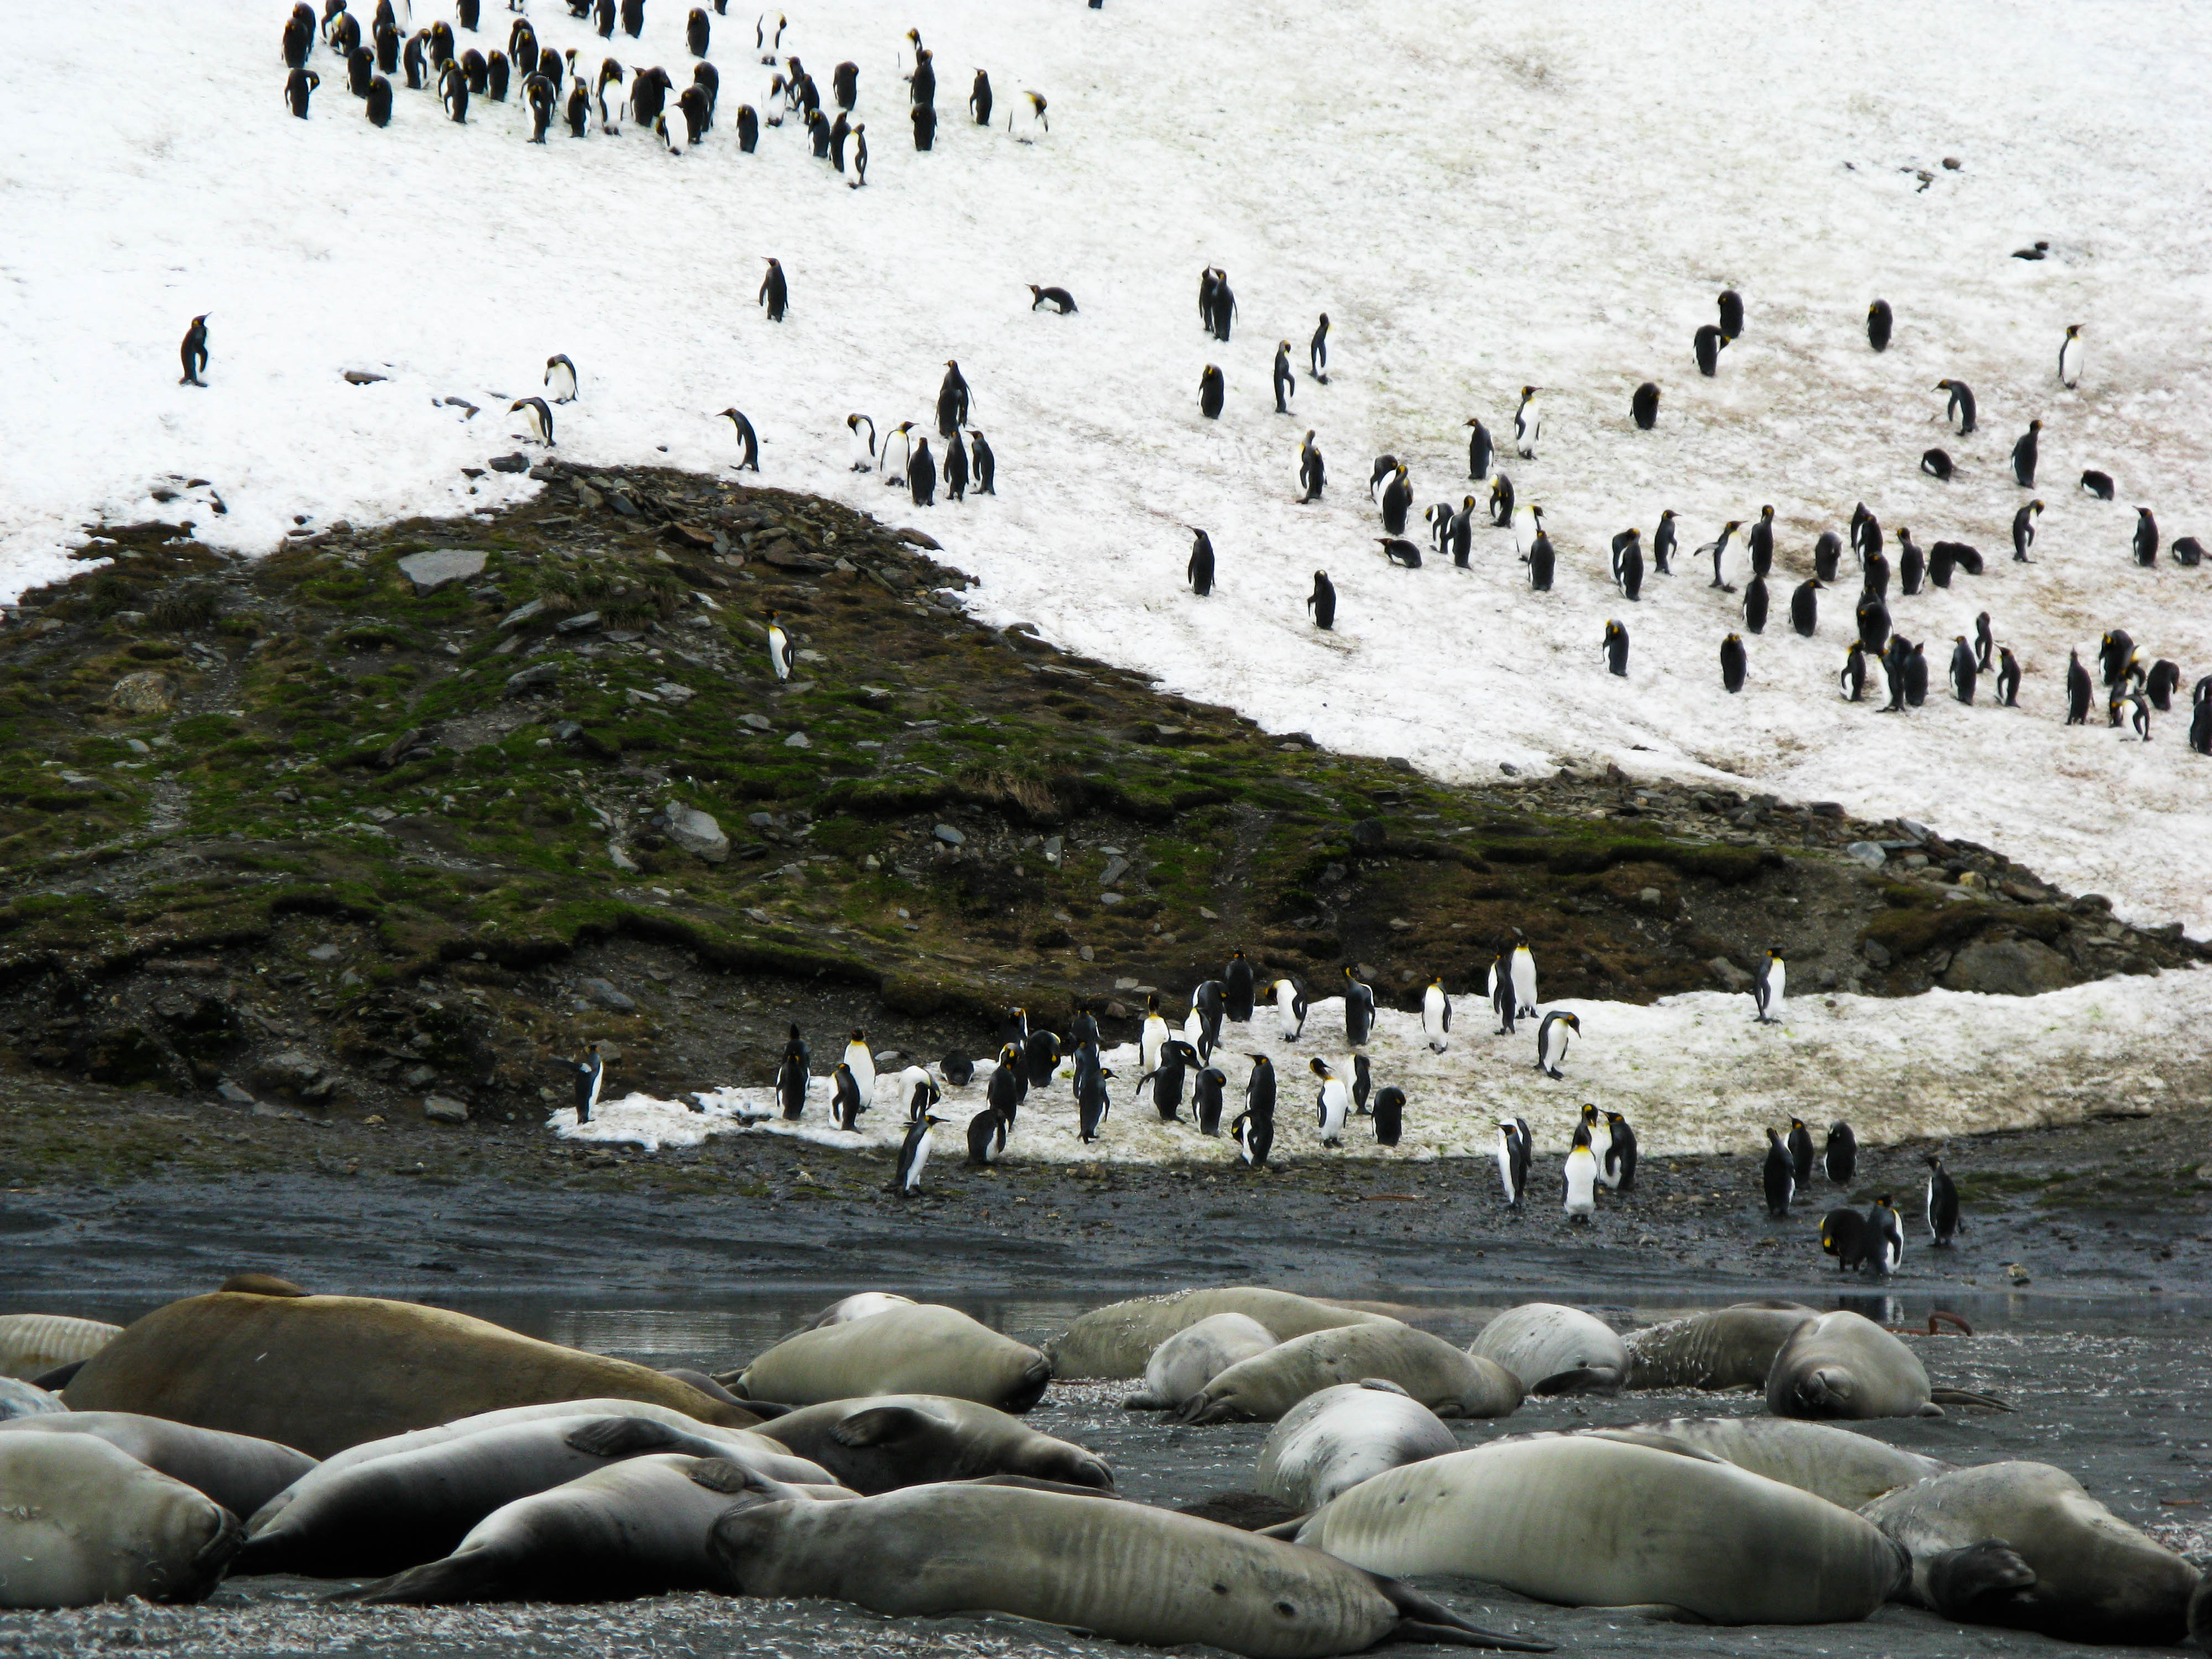 King Penguin colony, Saint Andrew's Bay, South Georgia